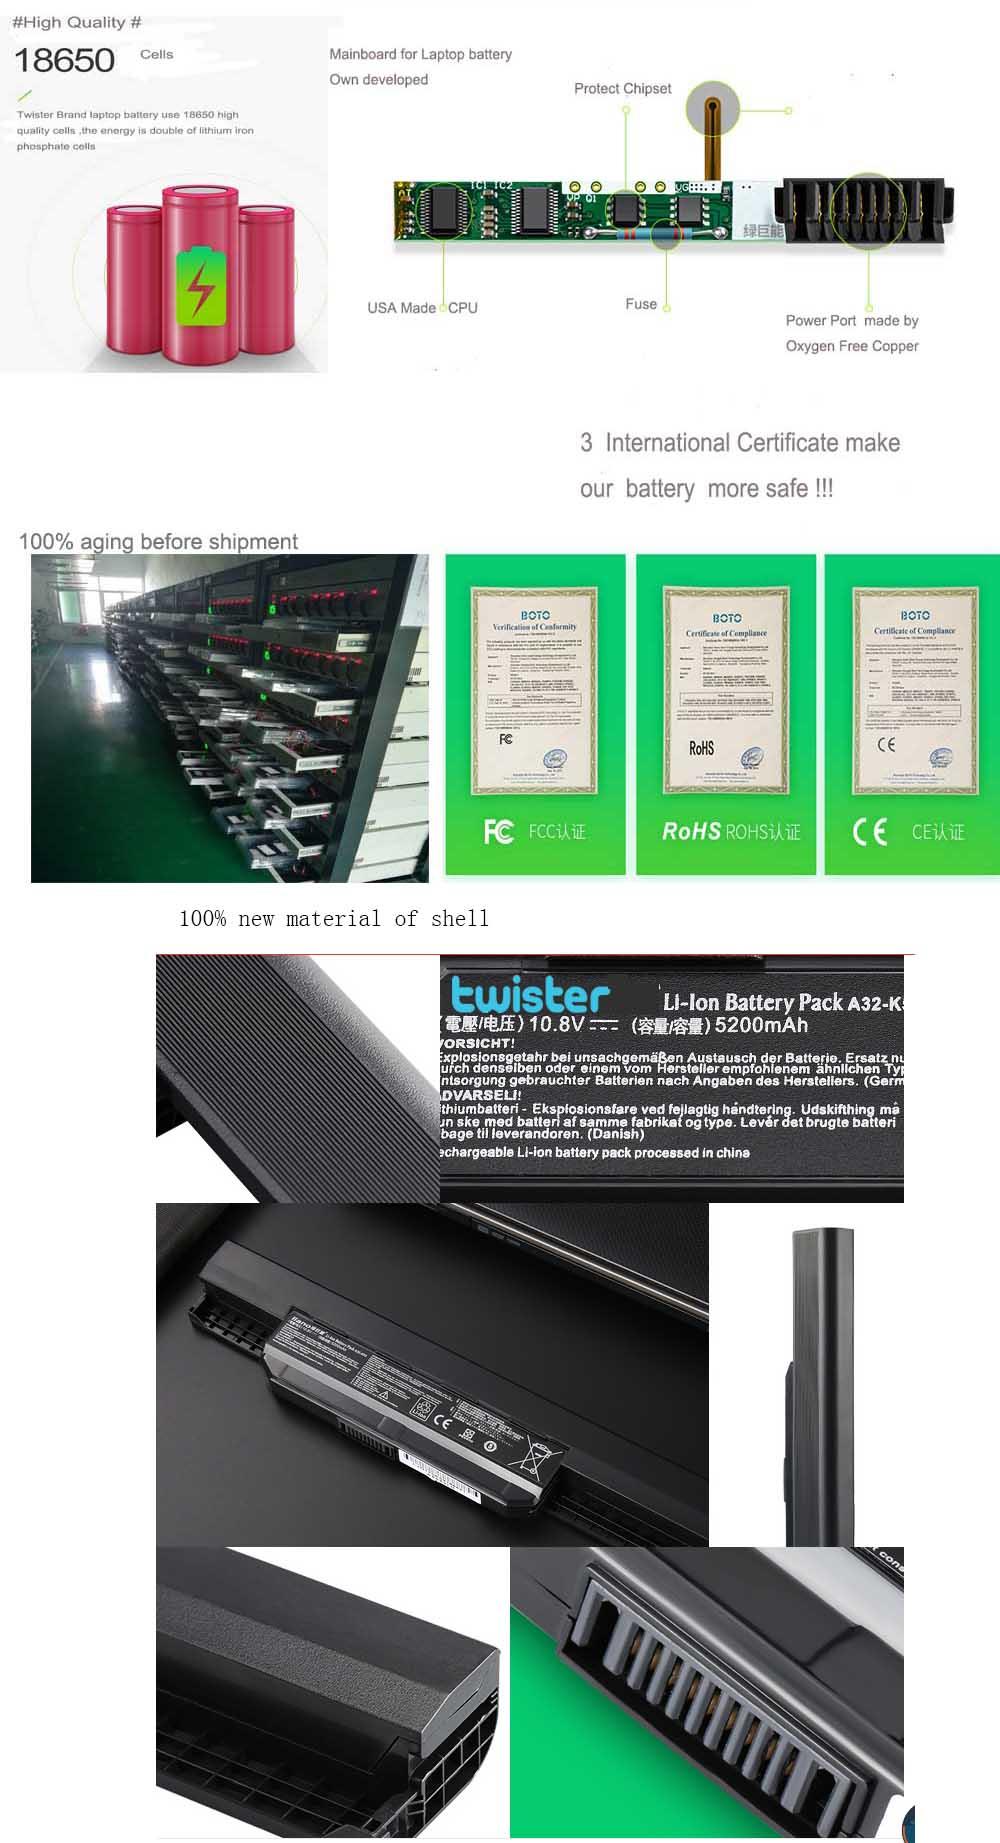 10.8V 4400mAh/48Wh Laptop battery for Acer 4250 5250 4741 AS10D31 AS10D41 4741-4-3S2P